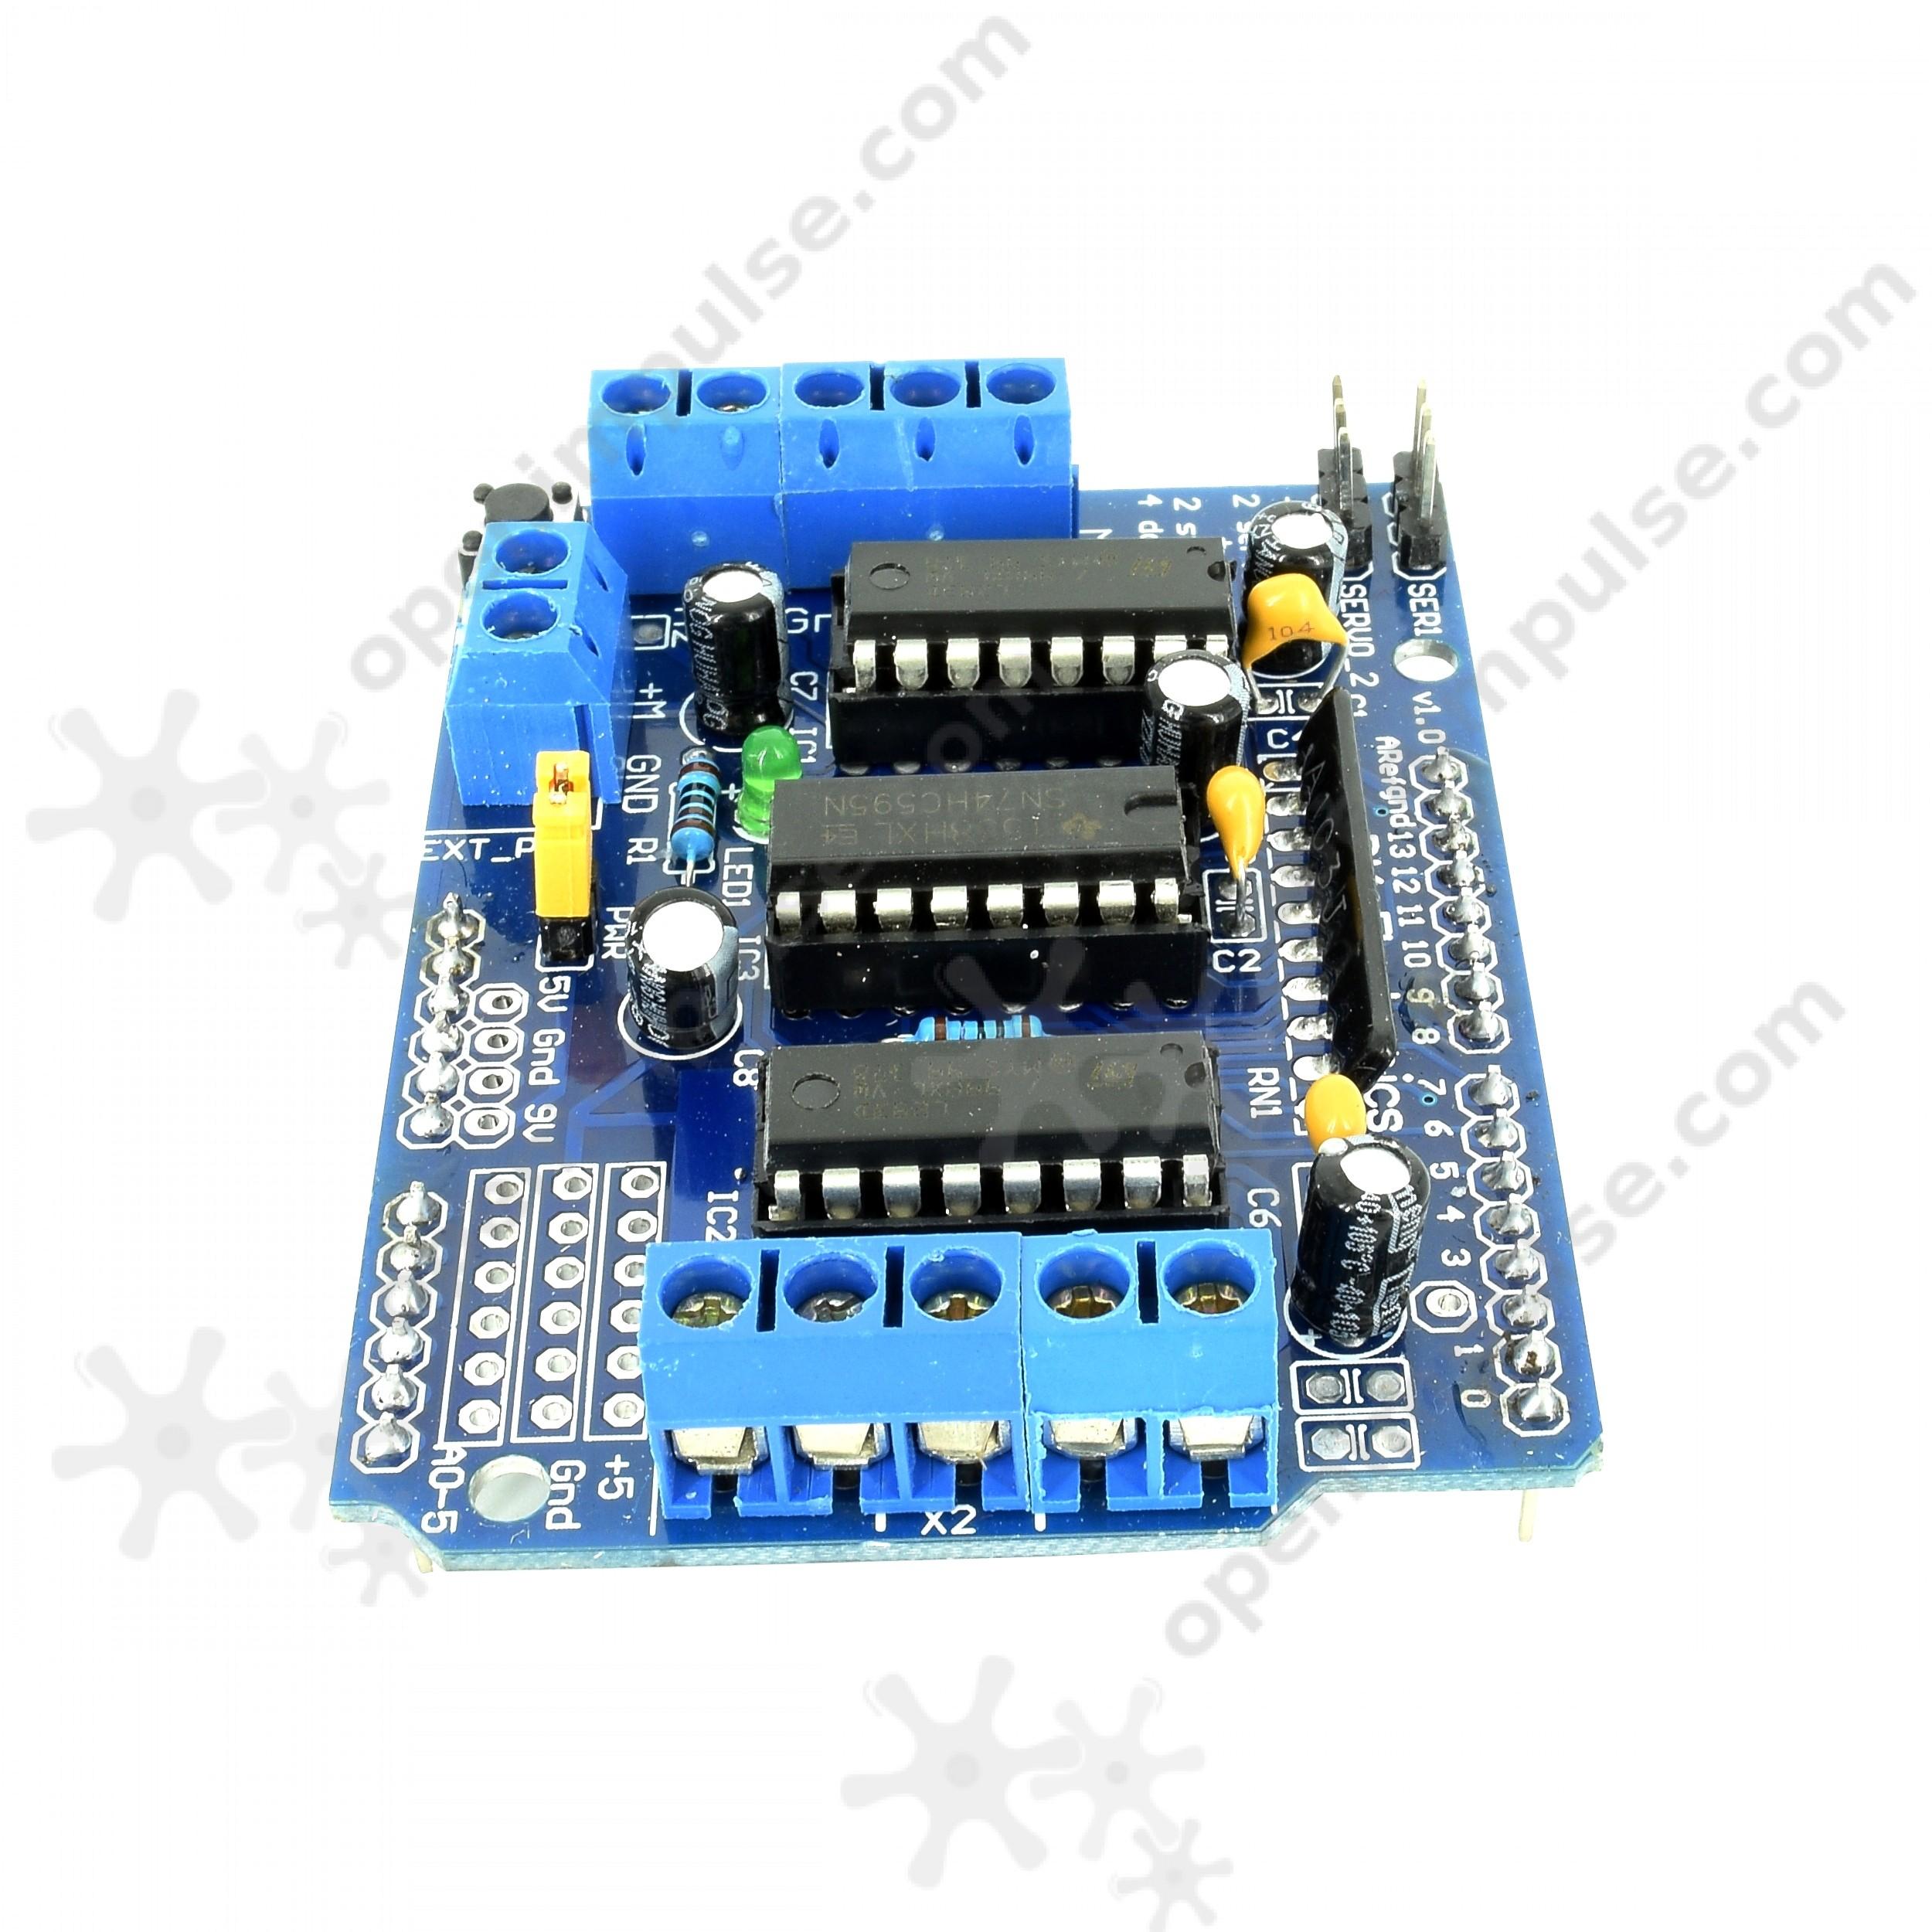 l293d motor driver circuit diagram pioneer deh 1800 wiring drive shield pinout impremedia